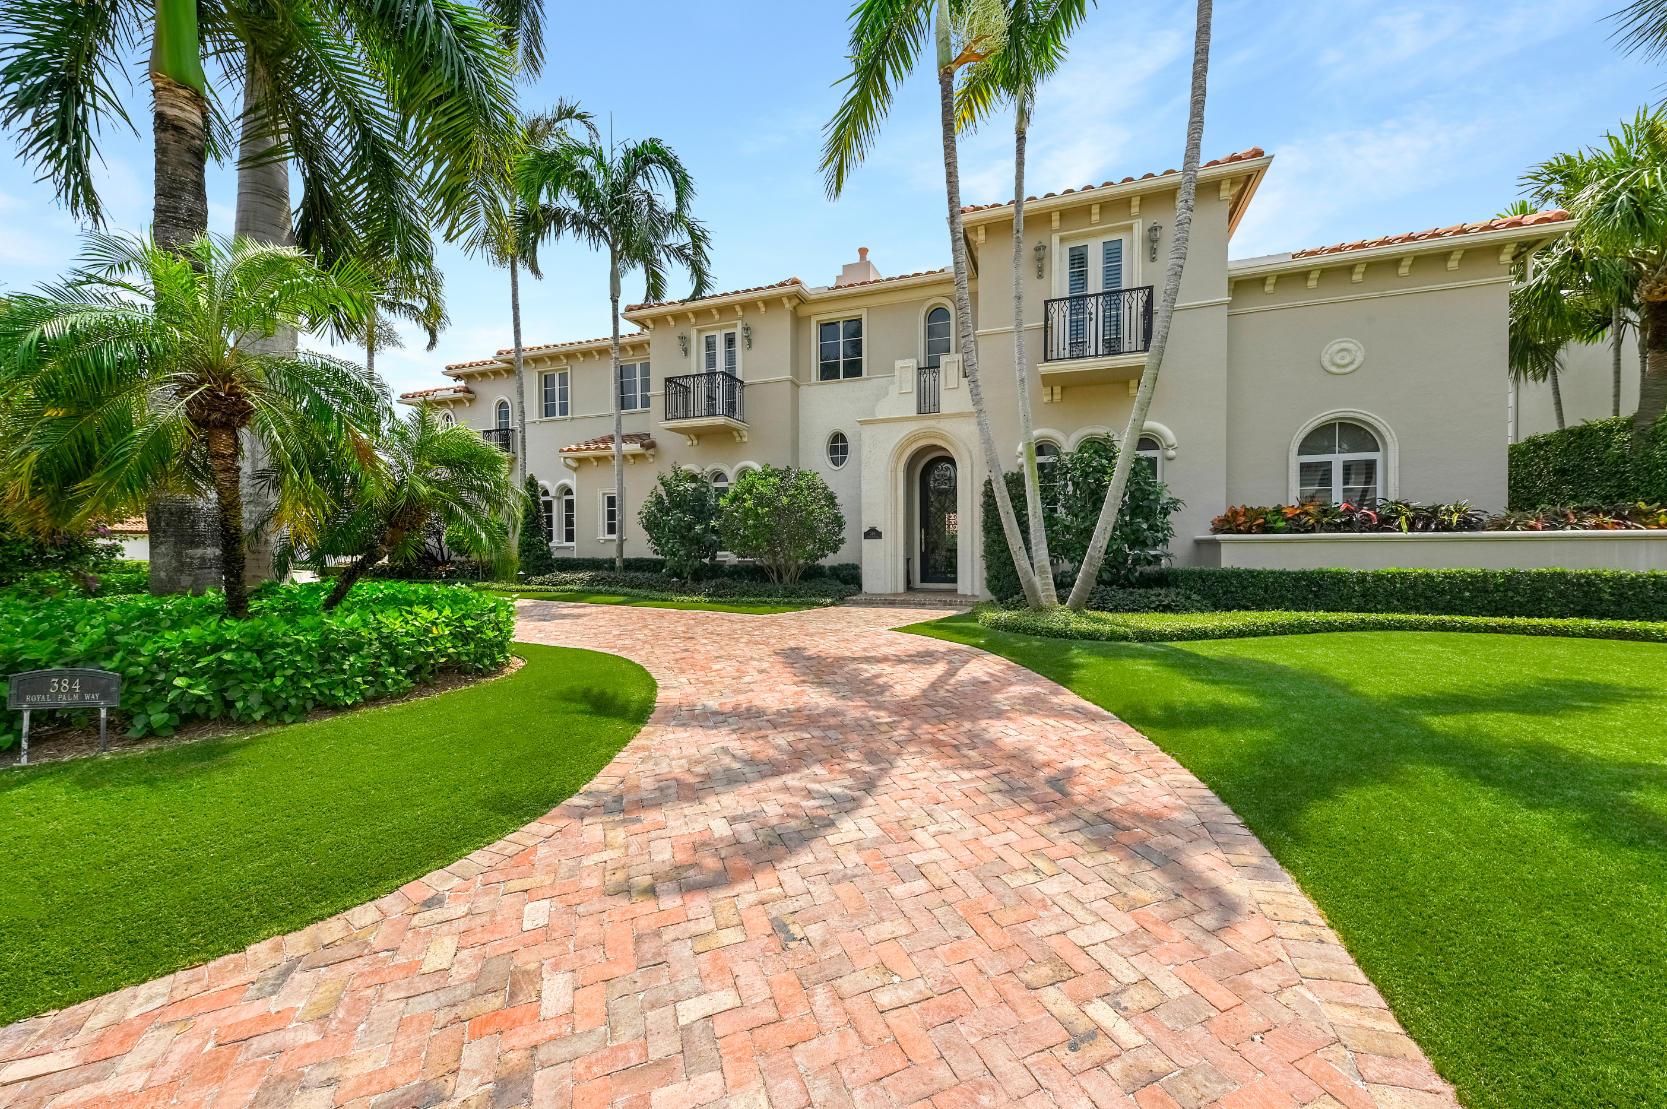 Details for 384 Royal Palm Way Way, Boca Raton, FL 33432